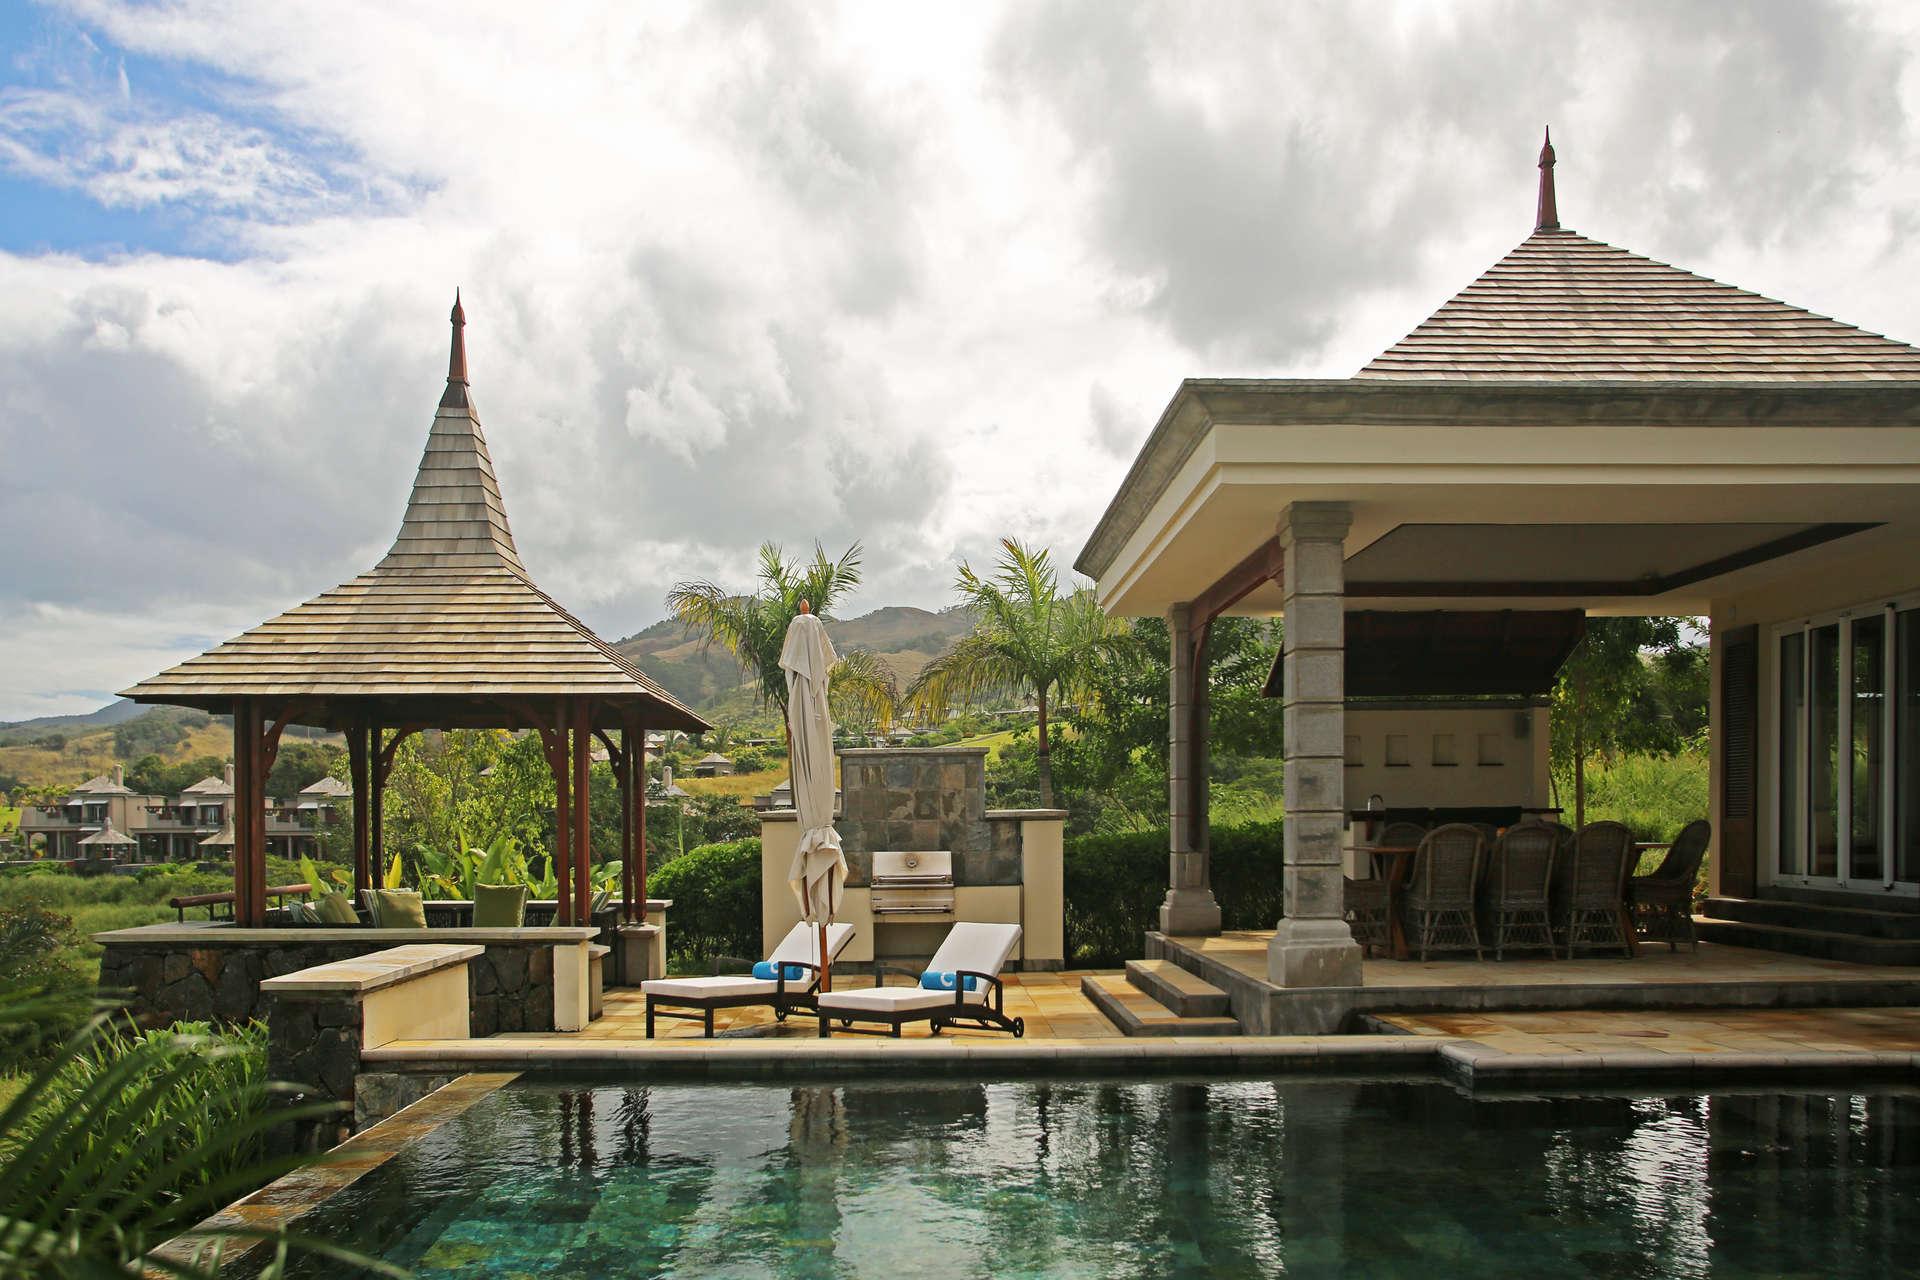 Luxury villa rentals africa - Mauritius - Bel ombre - No location 4 - Bel Ombre 42 - Image 1/18